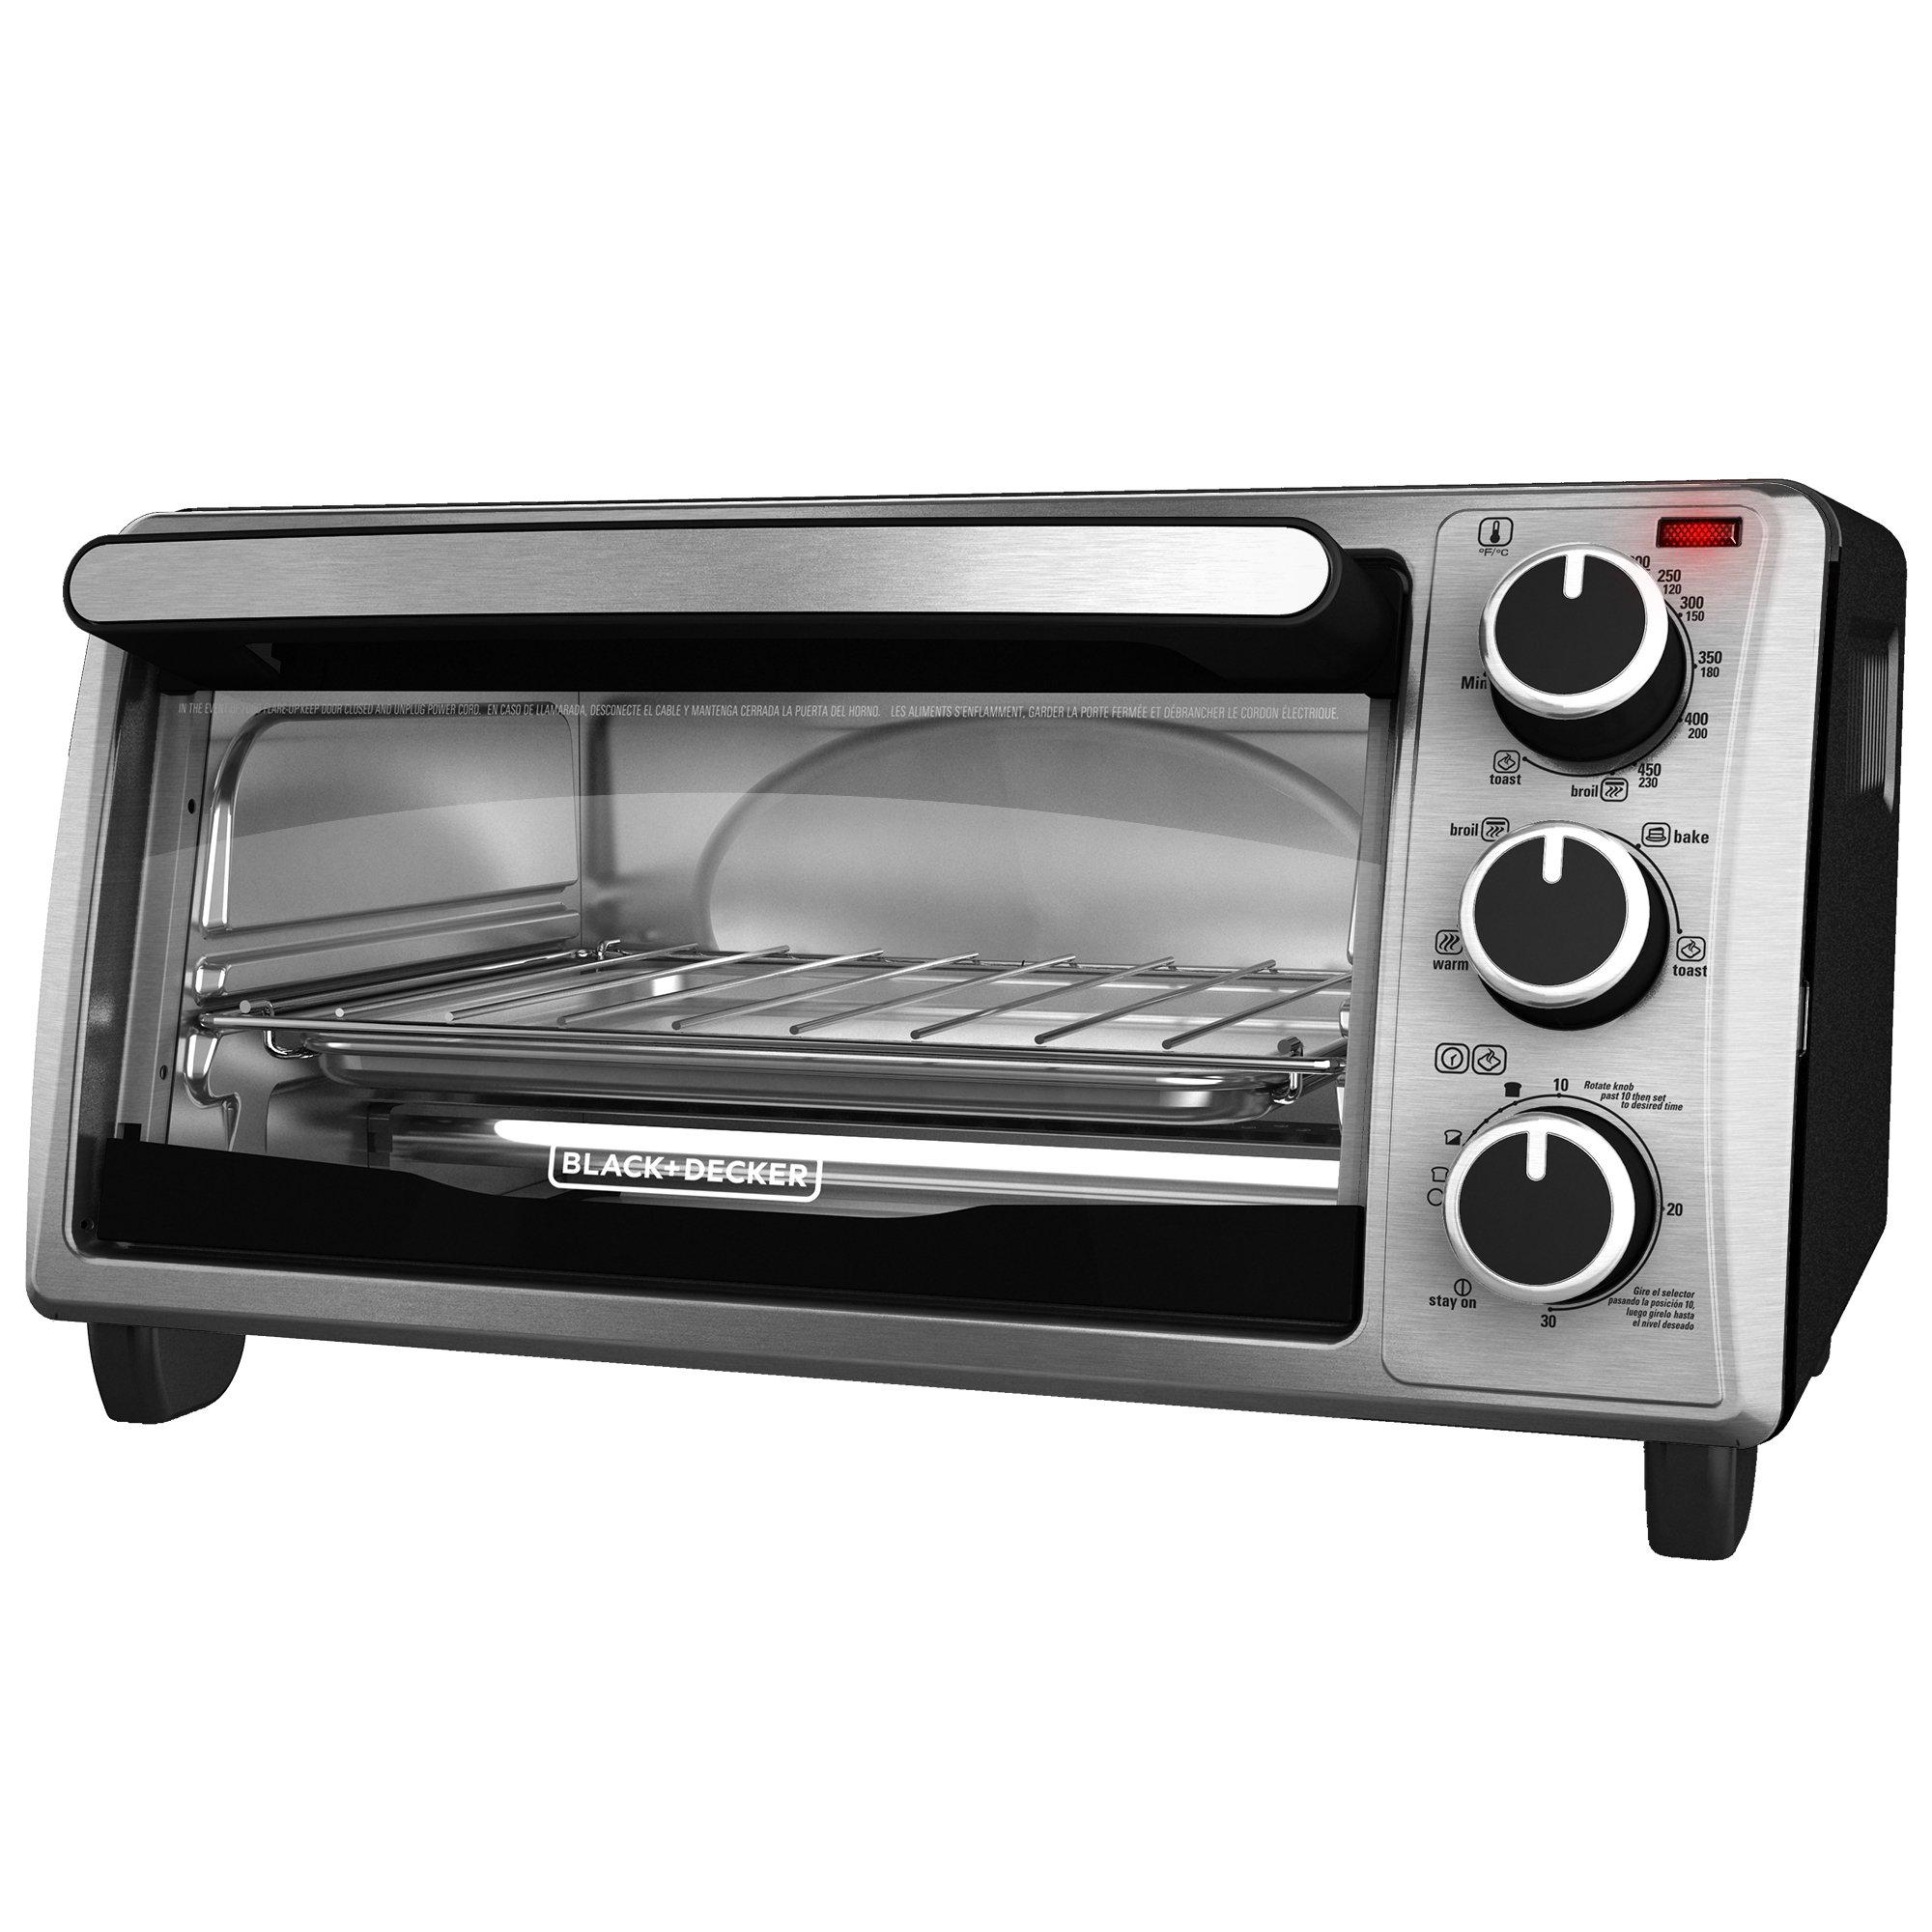 Galleon - BLACK+DECKER TO1303SB 4-Slice Toaster Oven ...